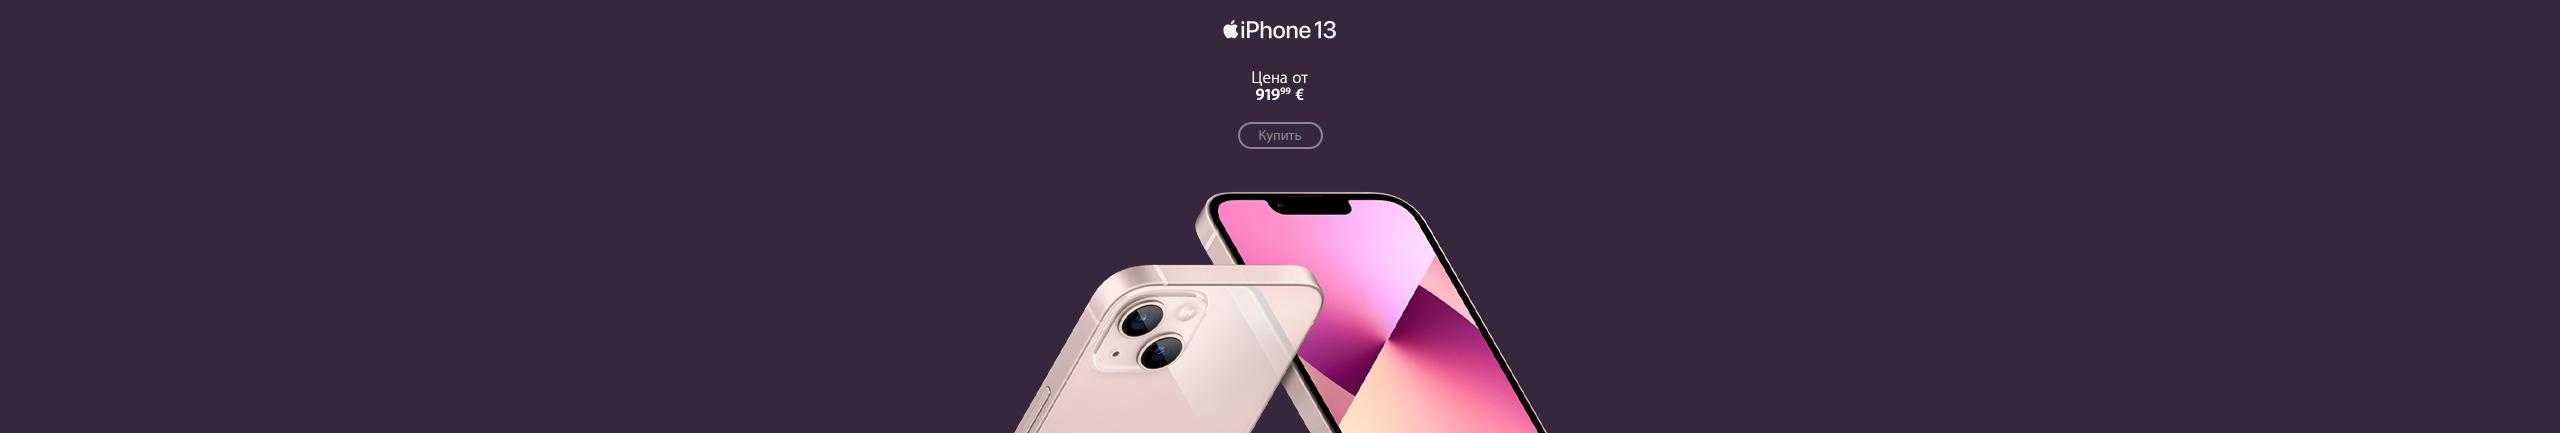 FPS Apple iPhone 13